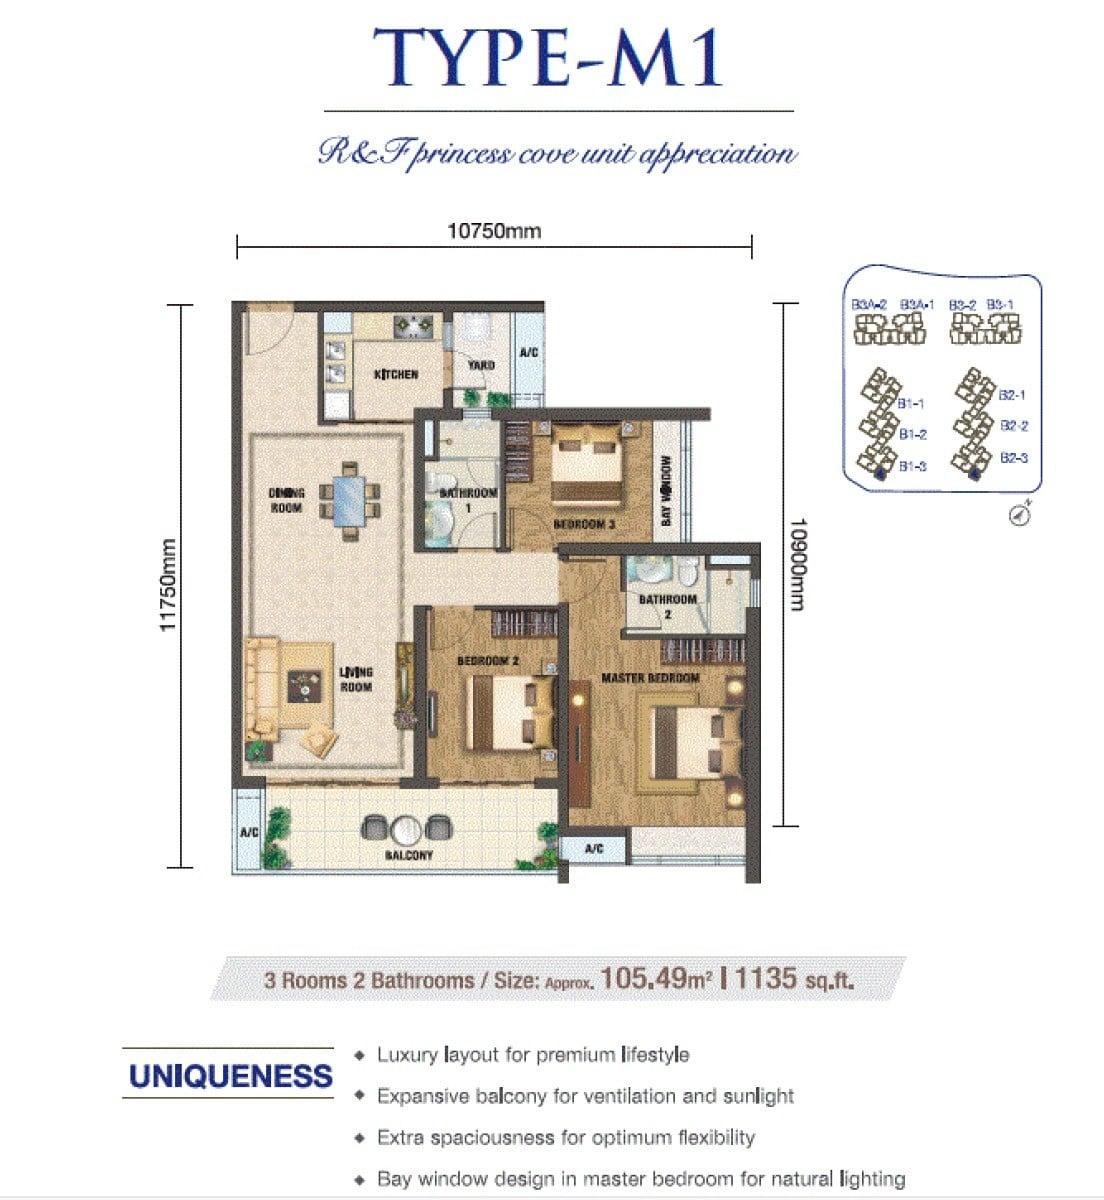 RF Princess Cove JB Floor Plan 3Bedroom